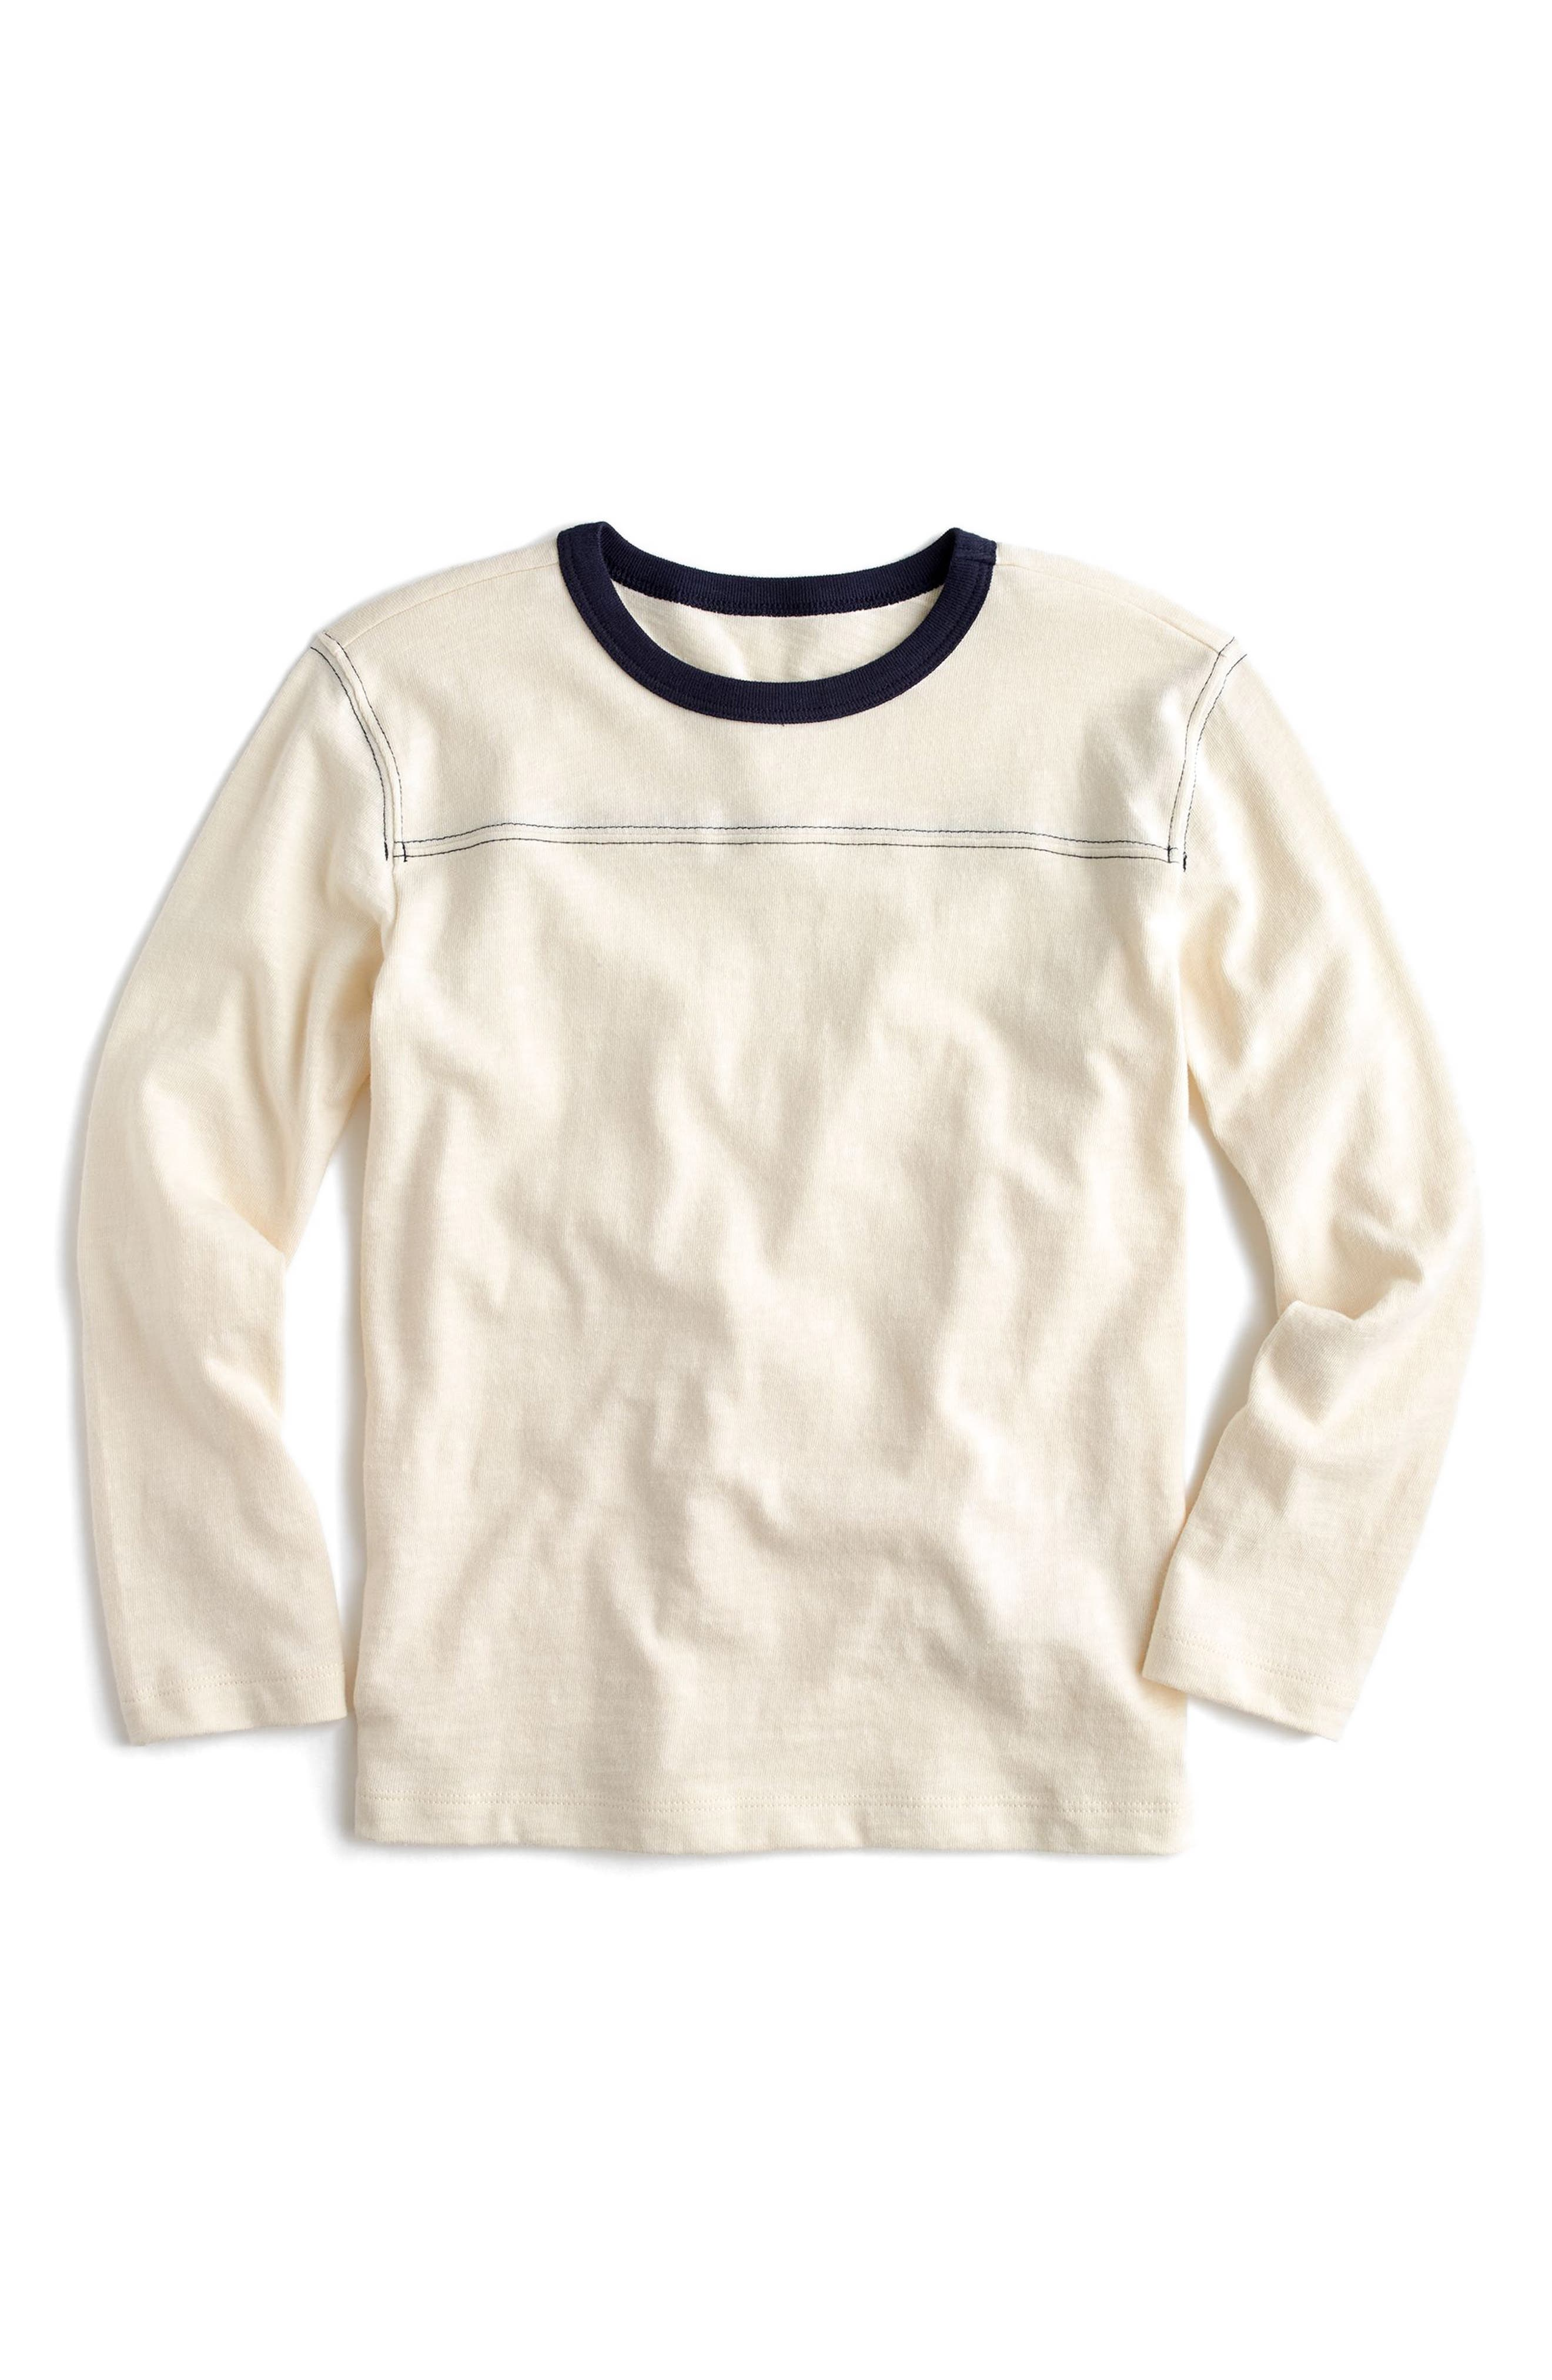 Long Sleeve Ringer T-Shirt,                             Main thumbnail 1, color,                             Washed Sand